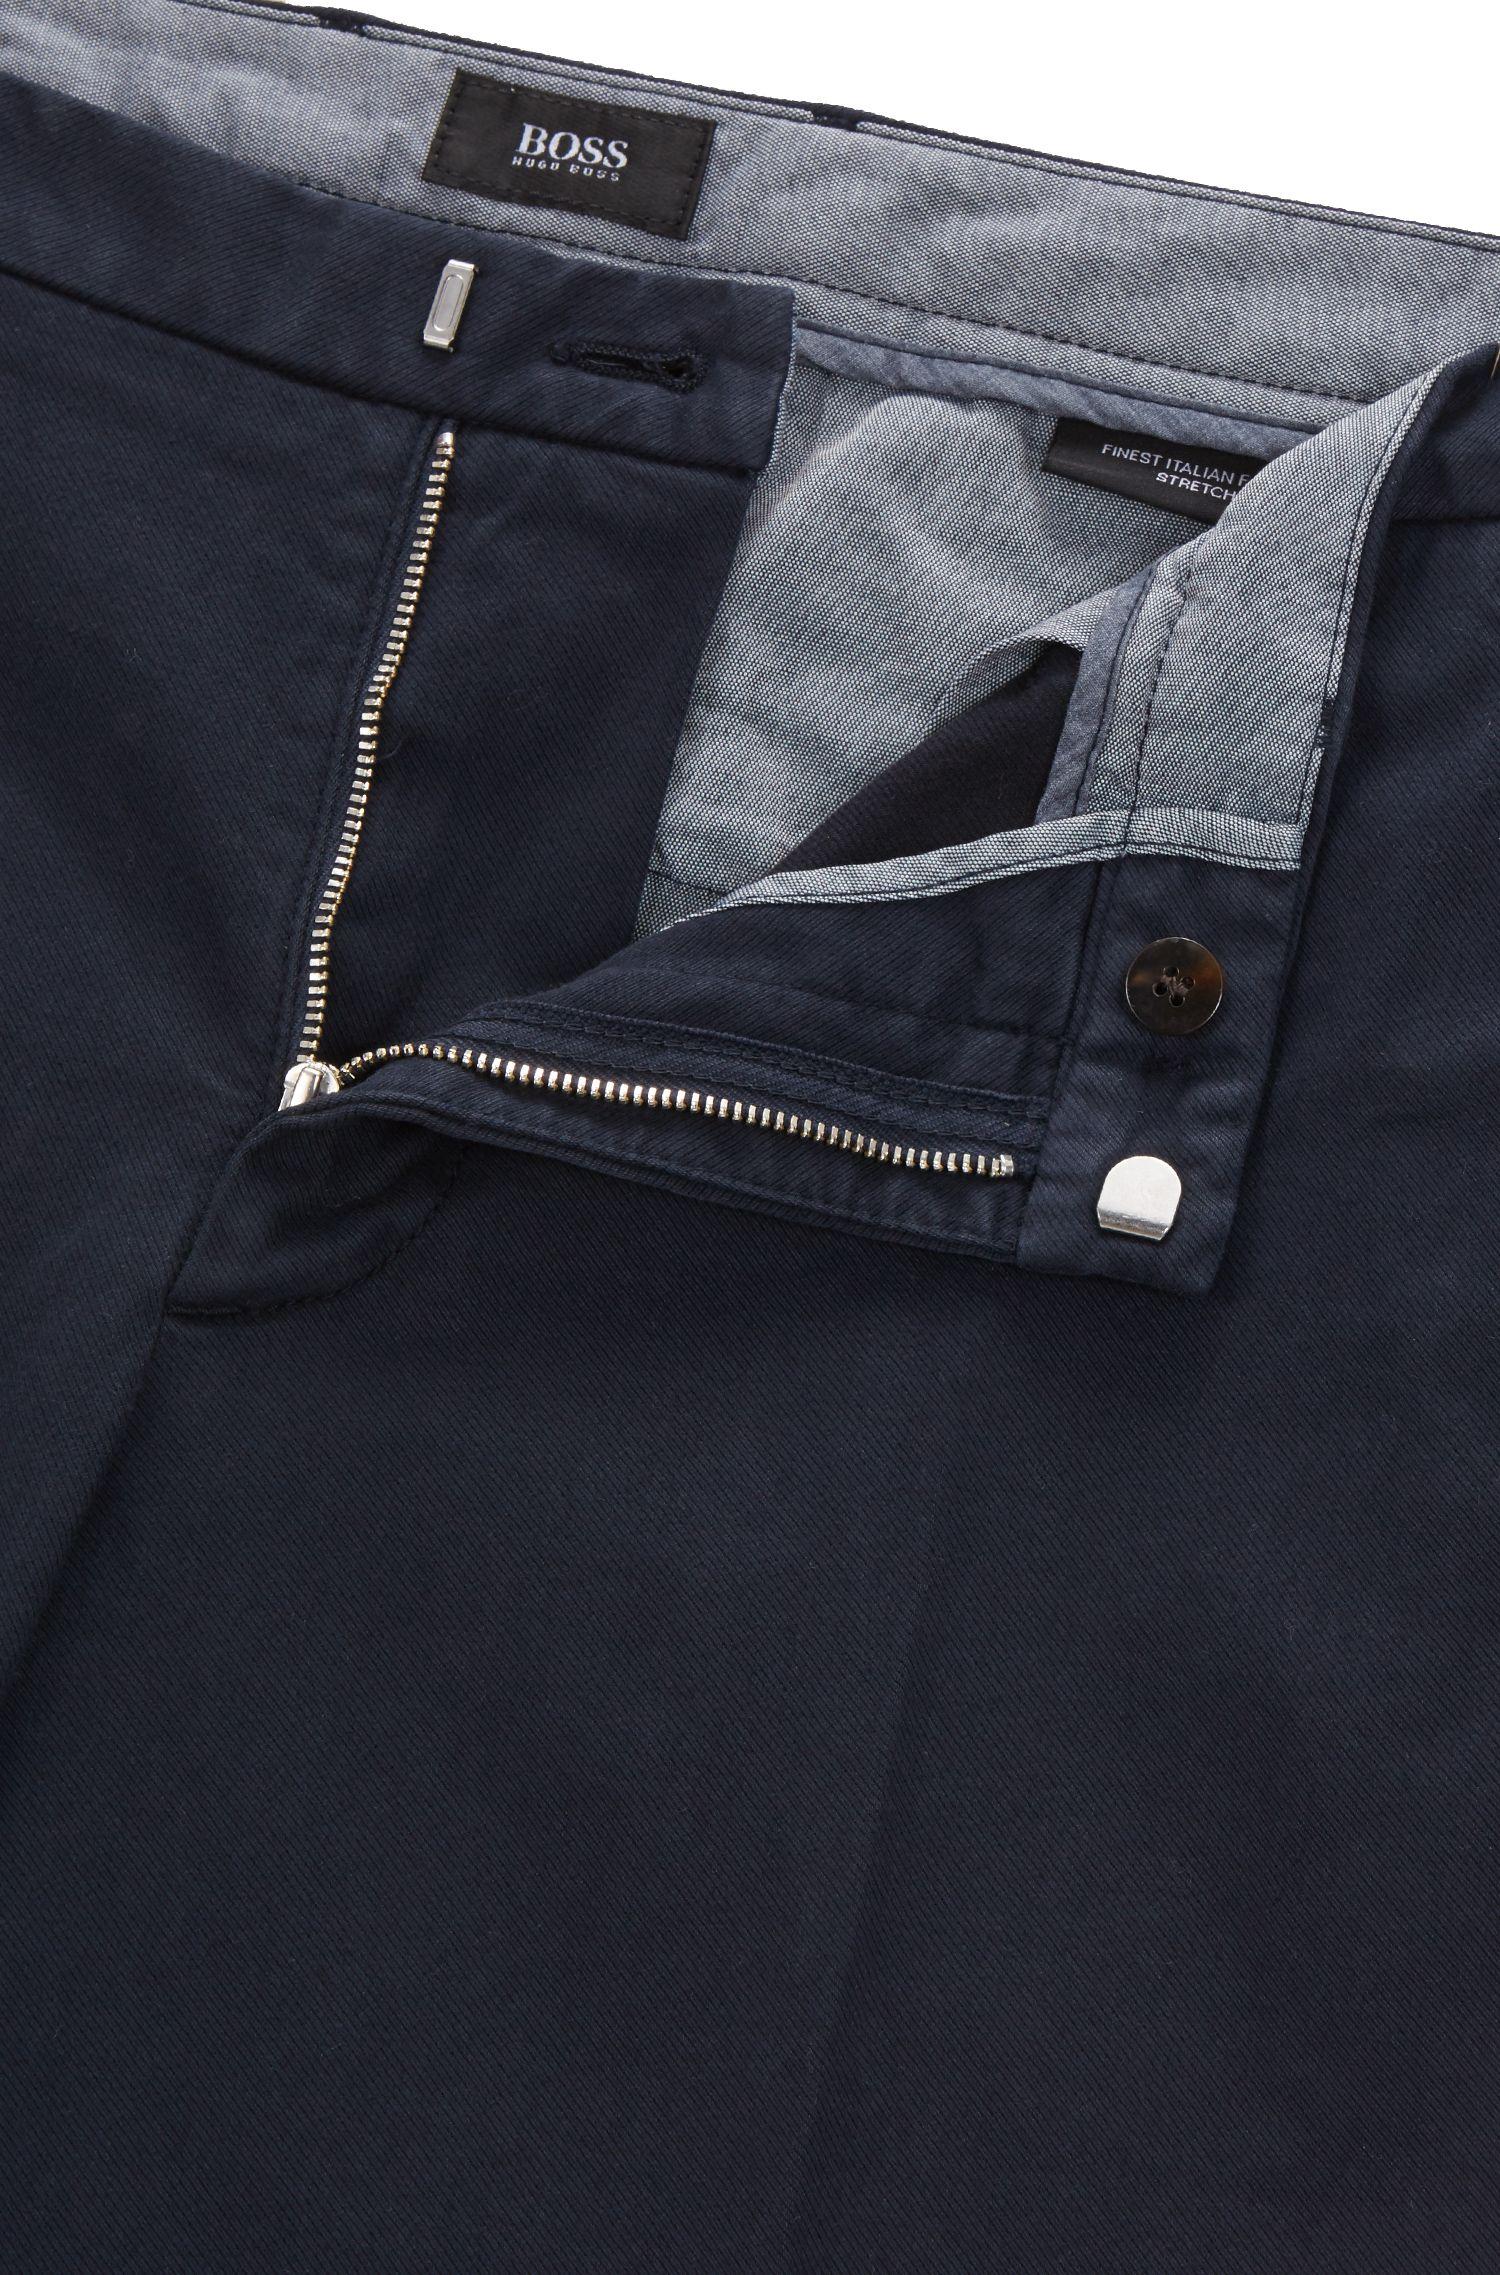 Slim-fit chinos in Italian stretch cotton